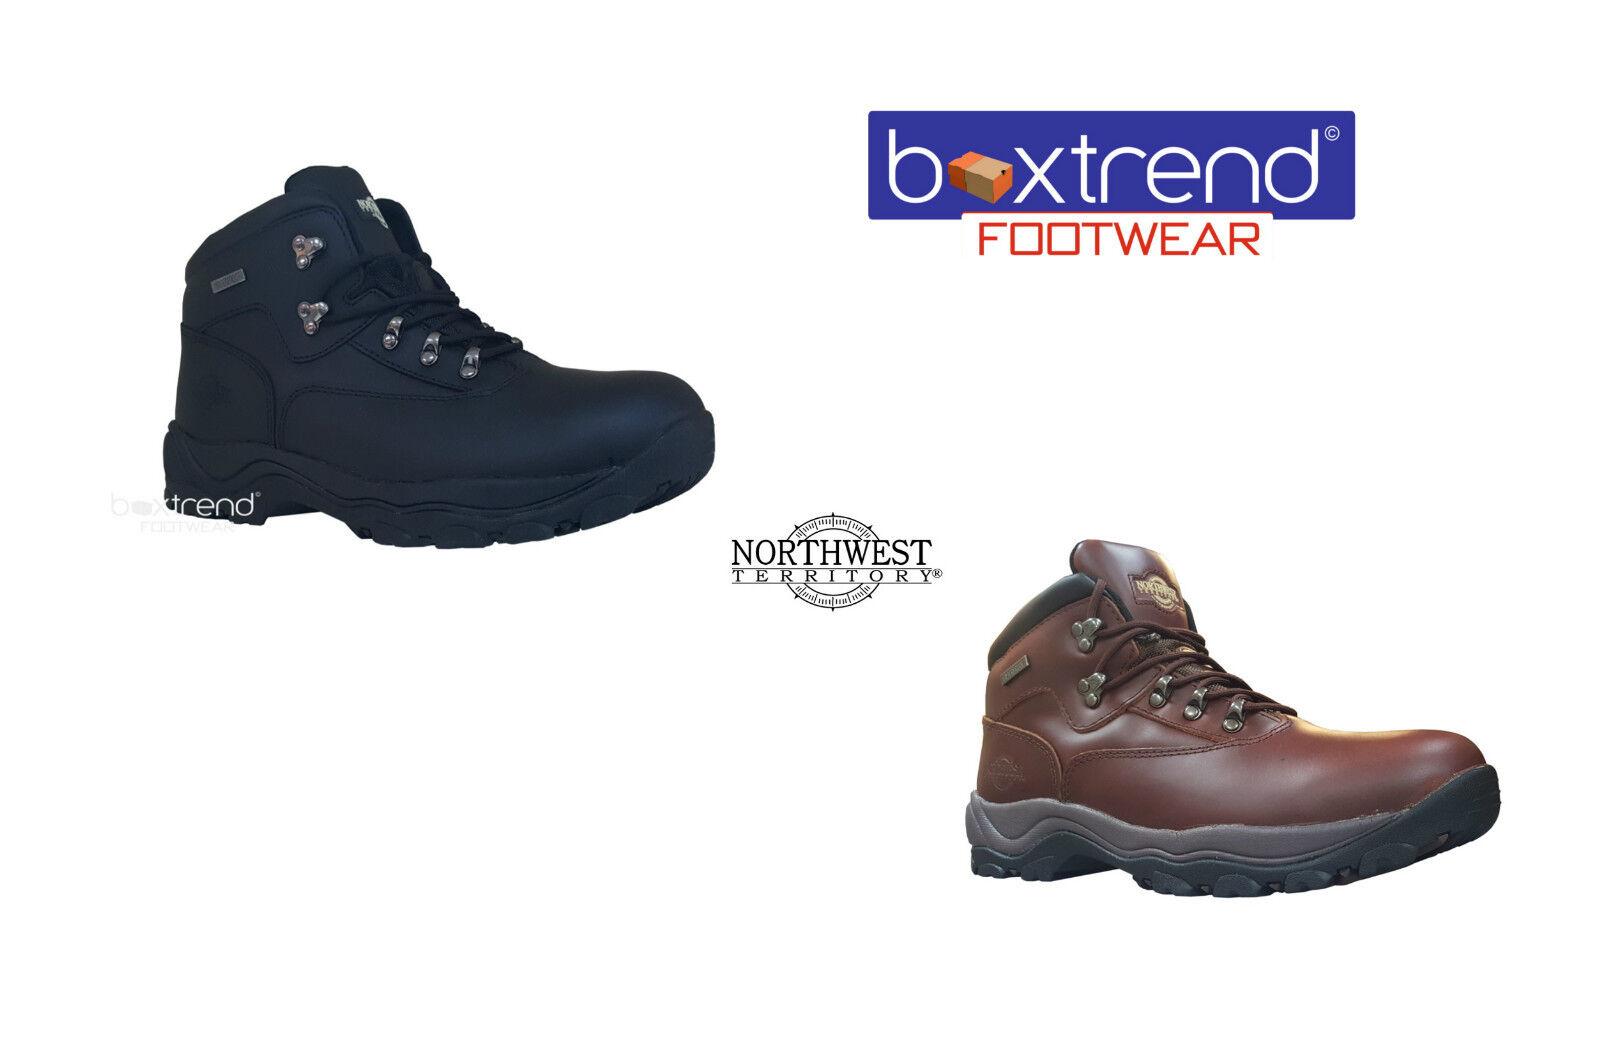 NUOVA linea uomo Northwest Territory Inuvik In Pelle Hiking Boots Impermeabile Trek Scarpe